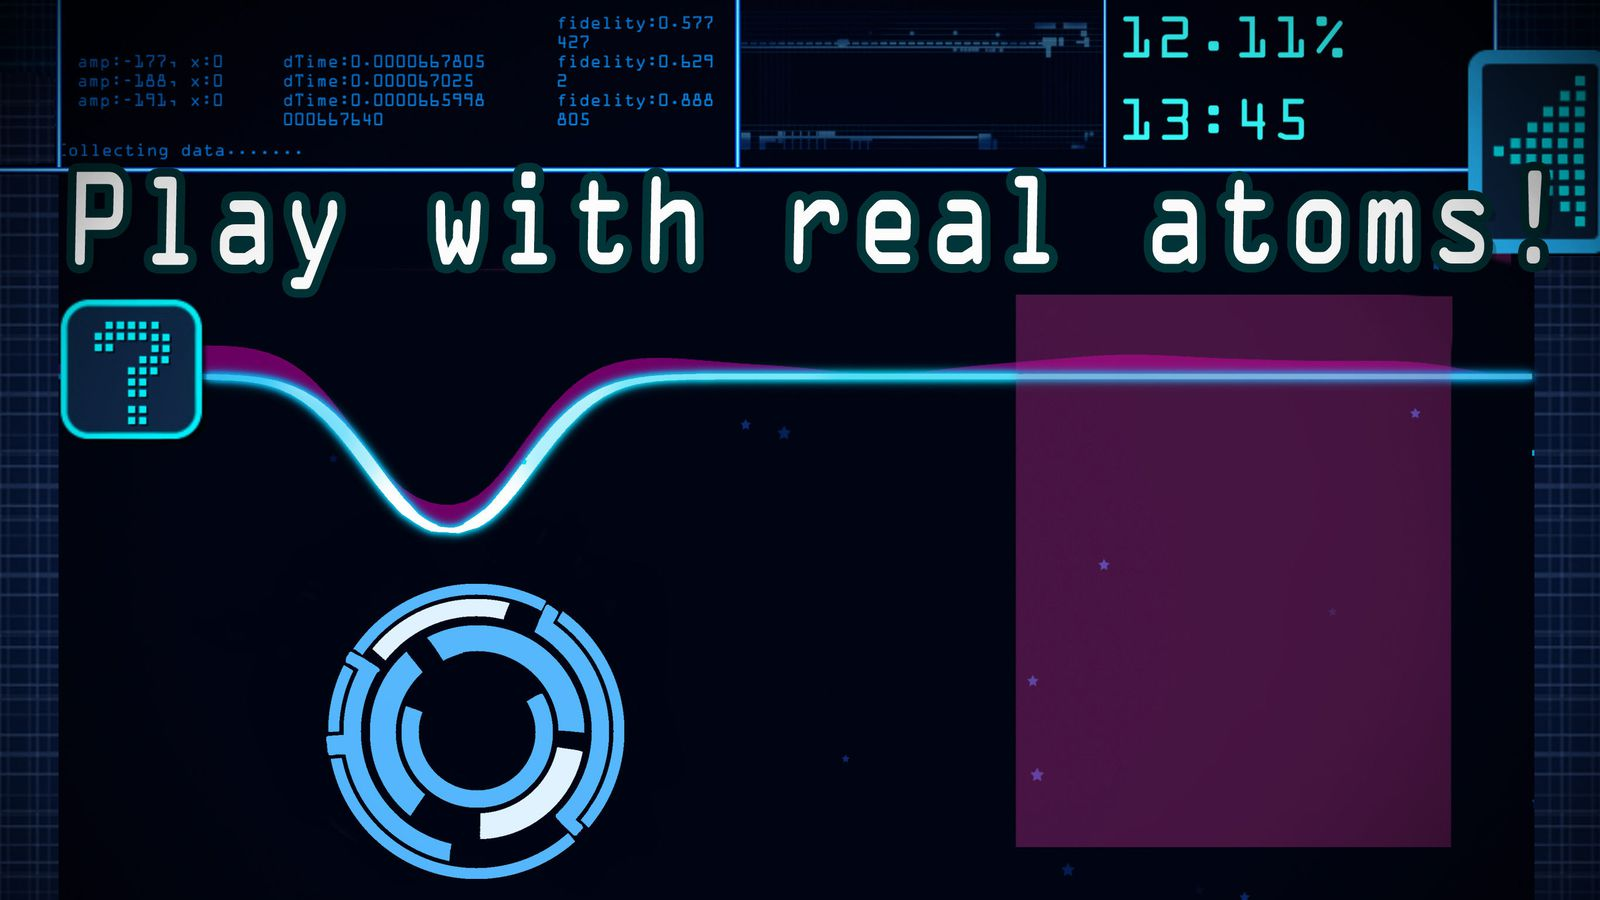 Quantum Moves - האם זה המשחק שיביא לעולם את המחשב הקוונטי?